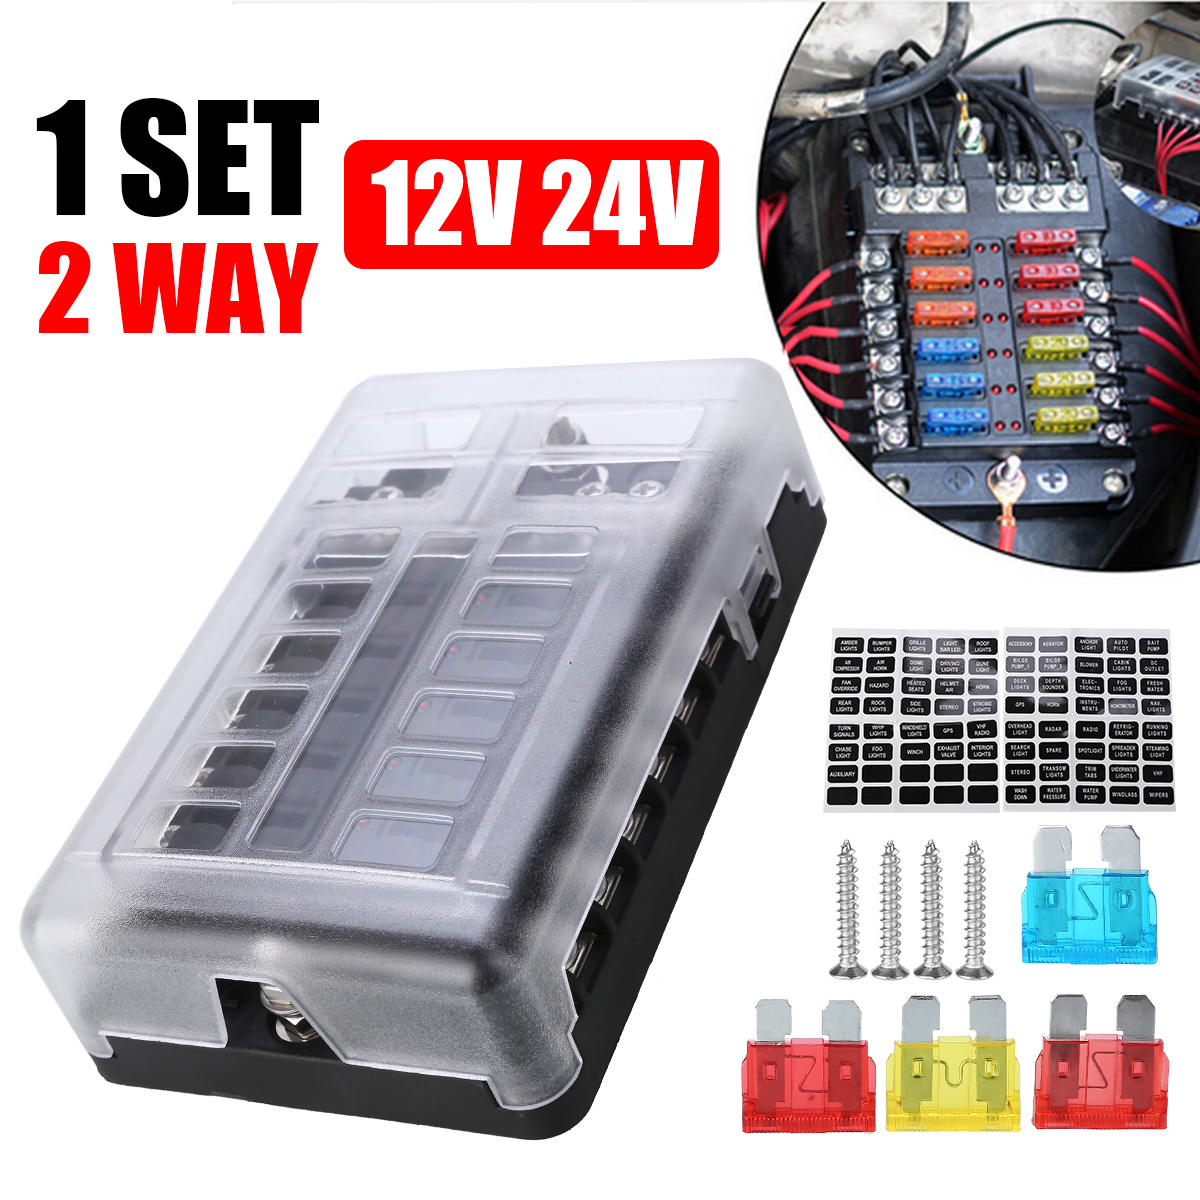 rv fuse box covers 1set 12 way plastic cover fuse box ats blade fuse caravan dual  fuse box ats blade fuse caravan dual